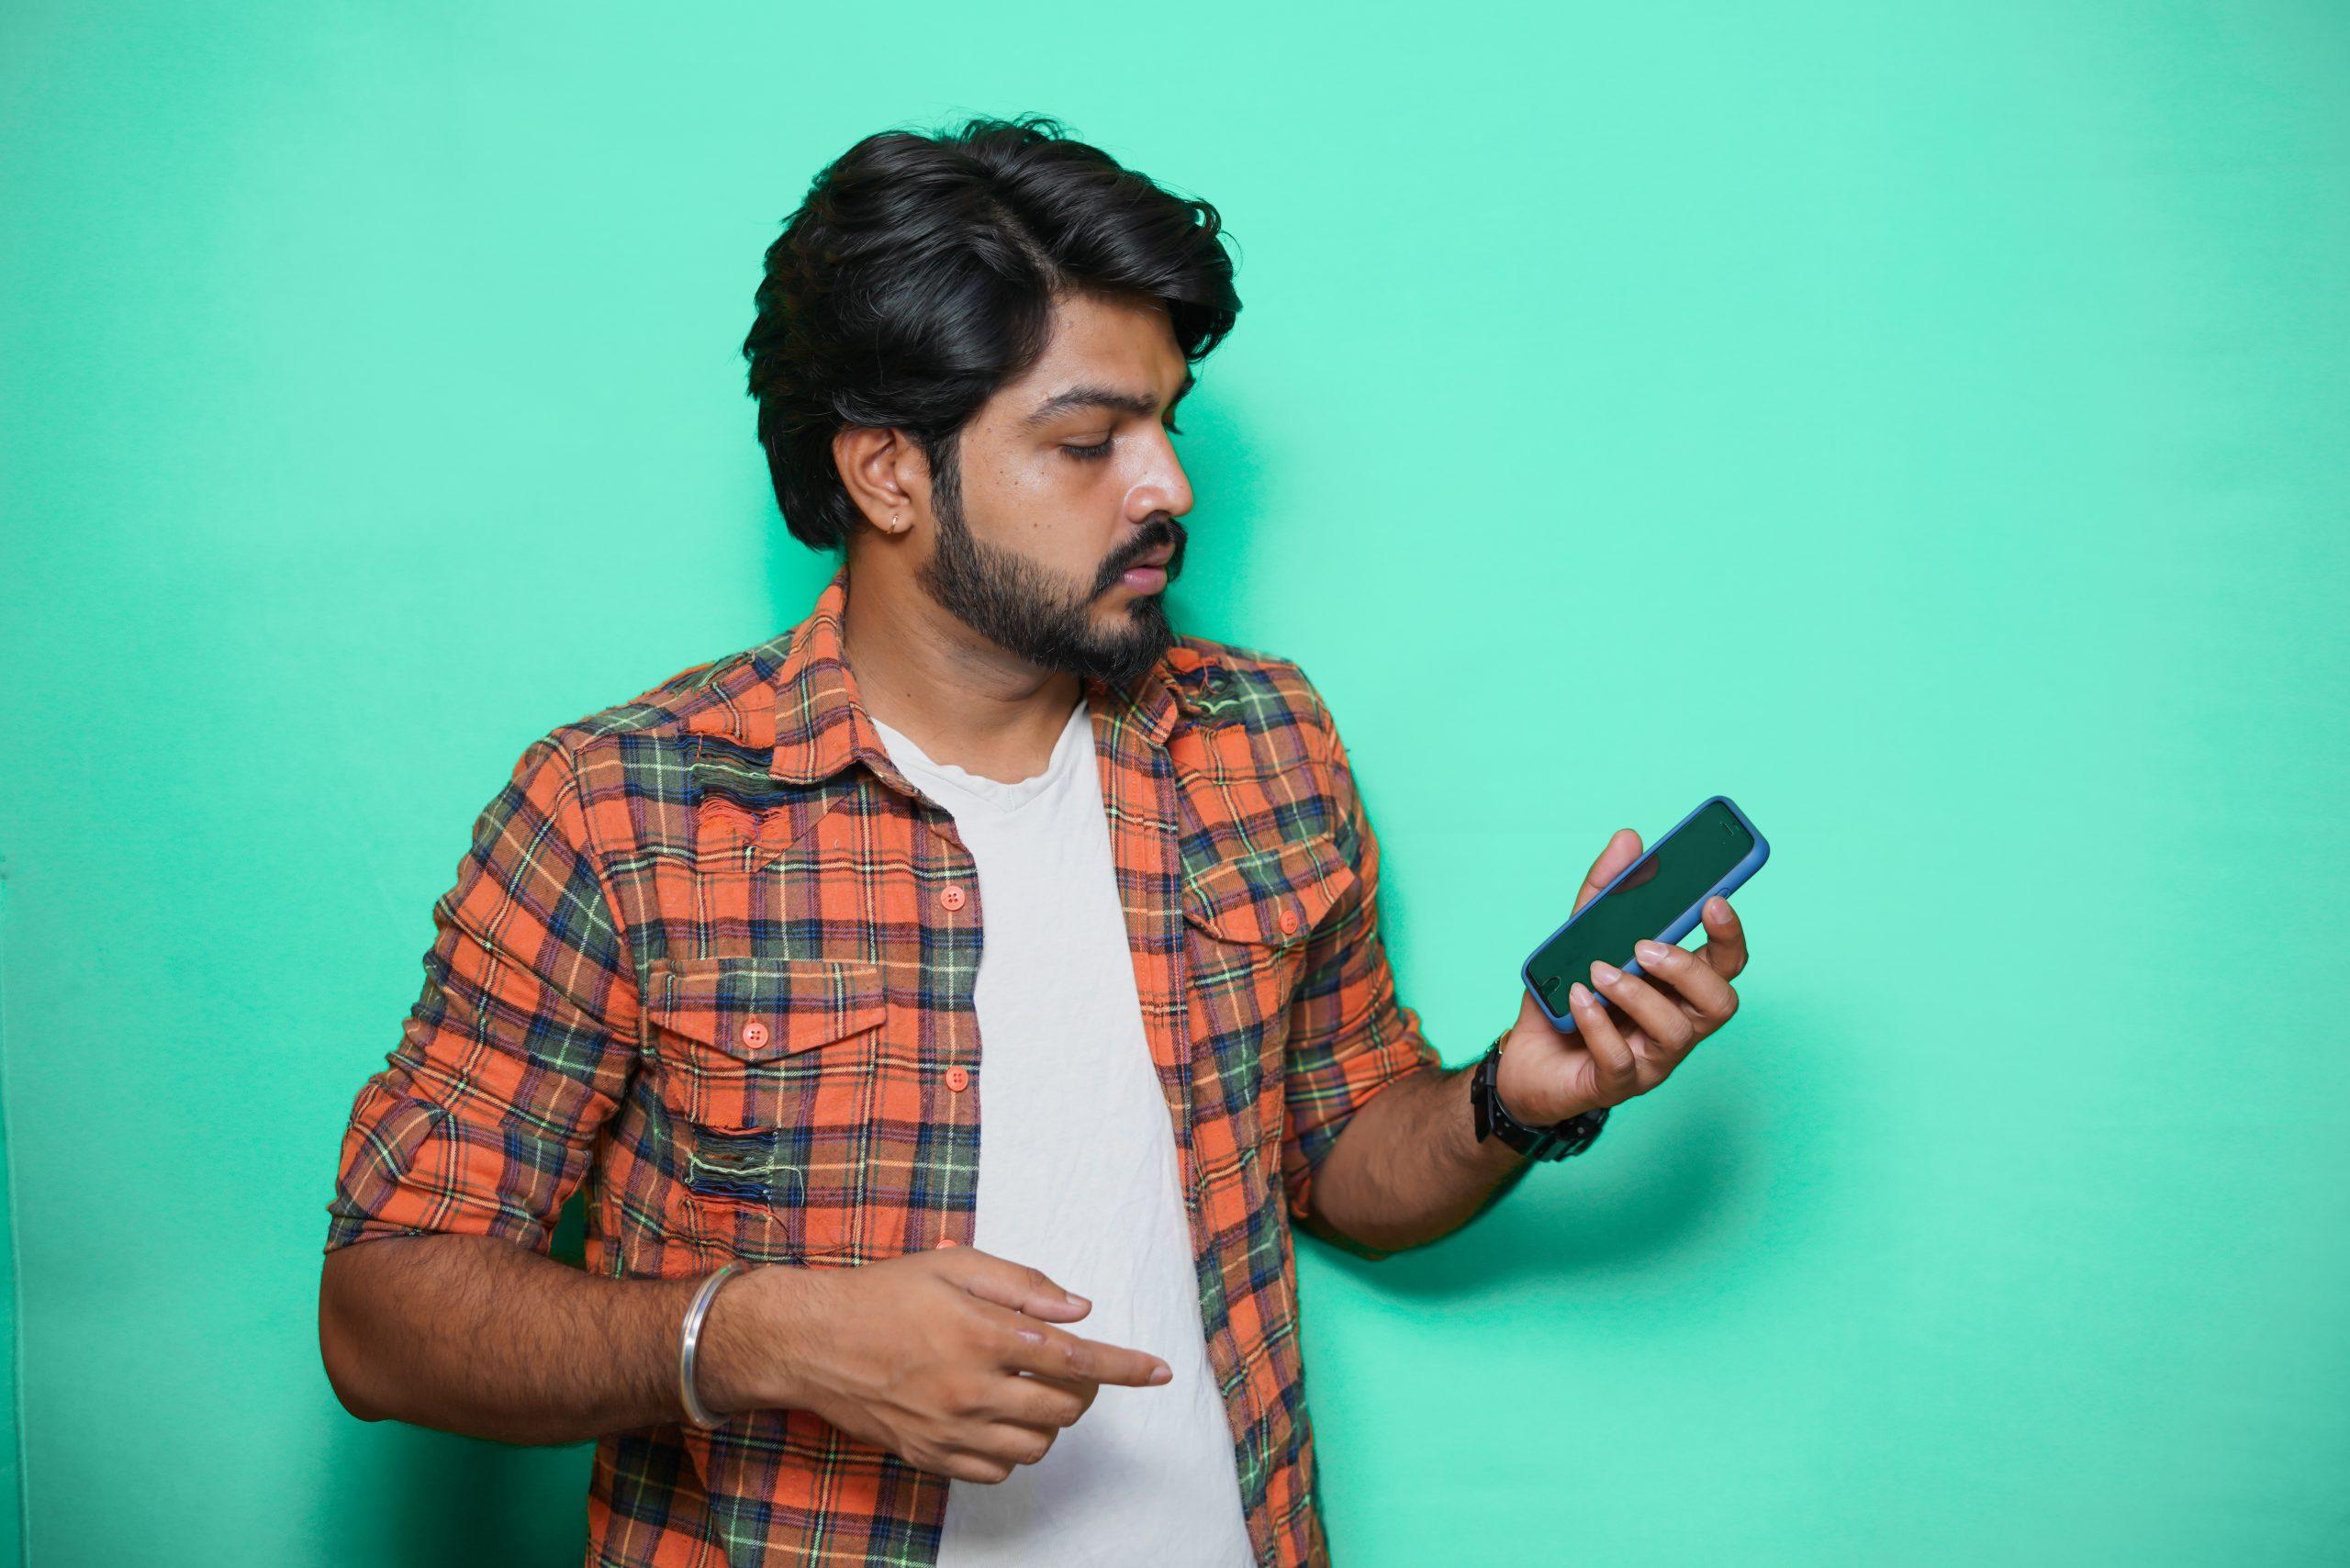 Man looking at his smartphone